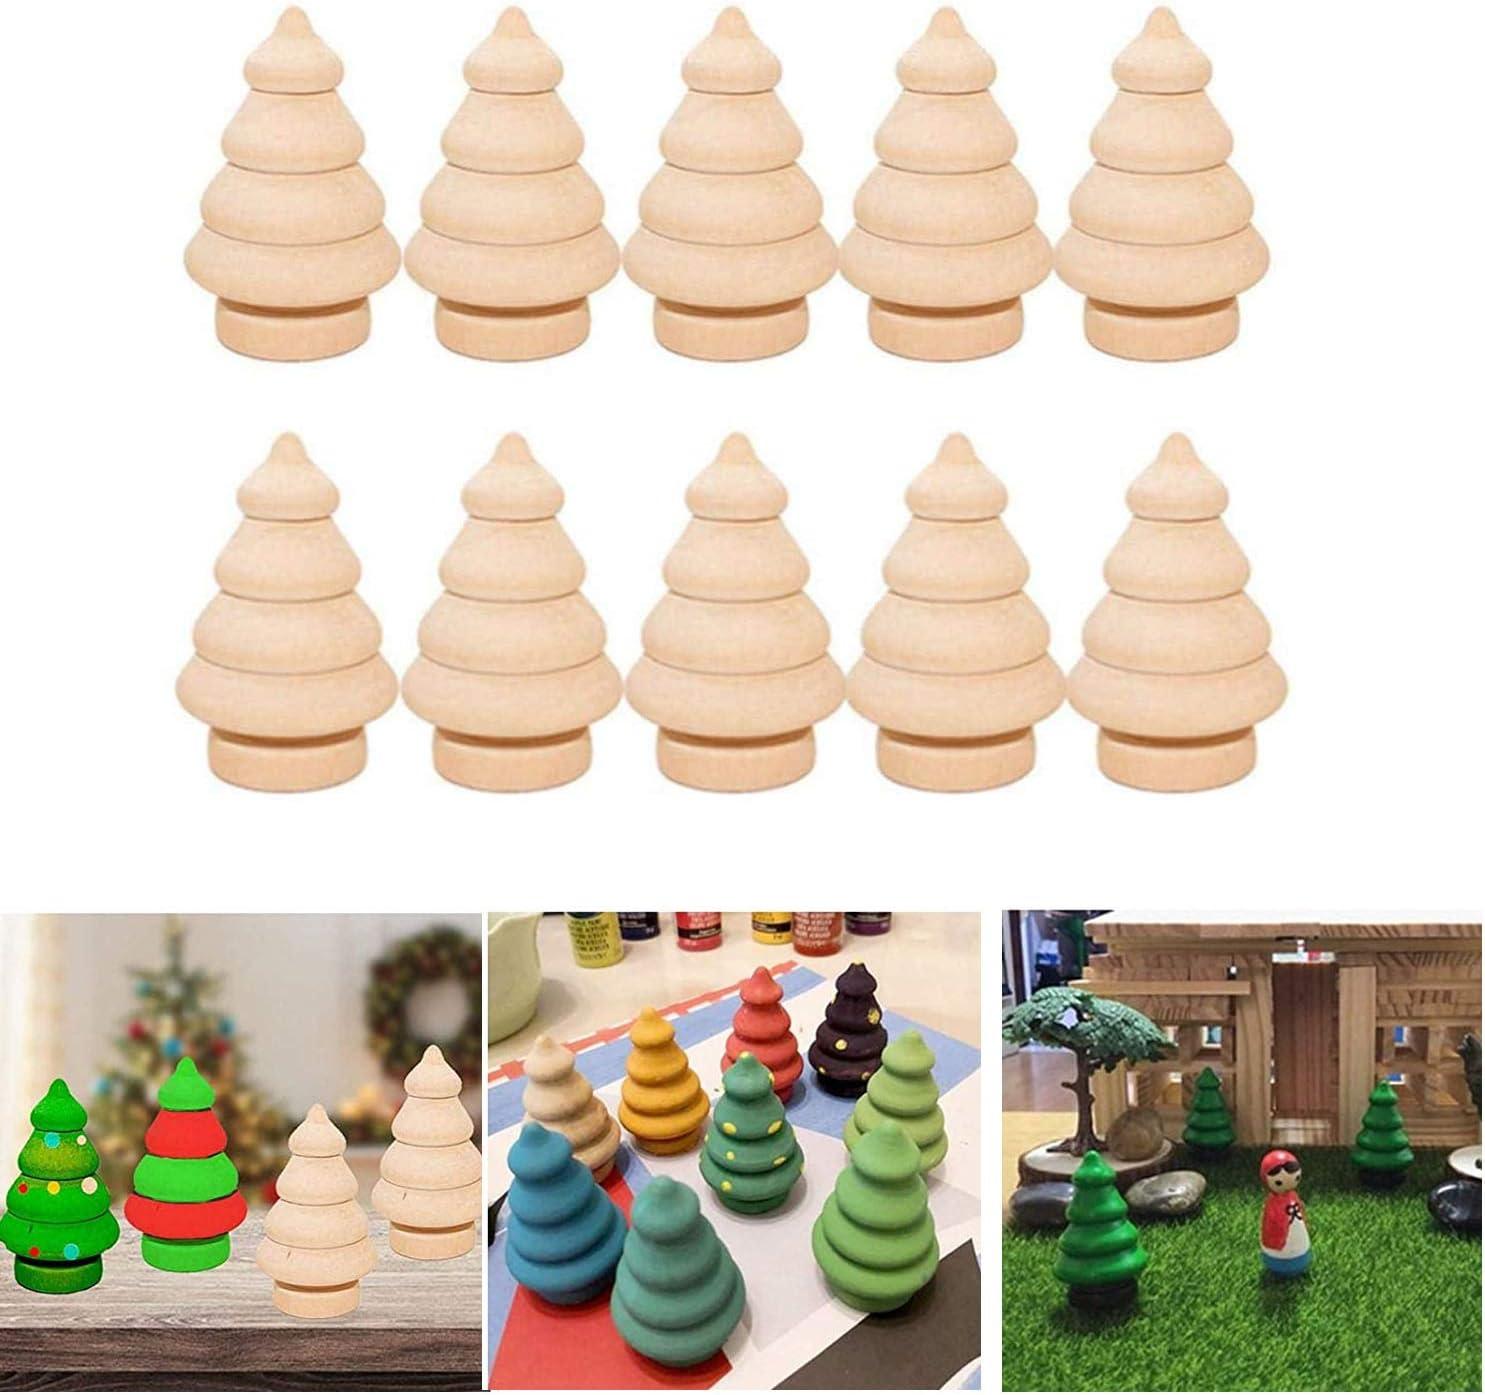 NEW 5pcs //10pcs Blank DIY Wooden People Peg Dolls Wedding Cake Toppers Craft DIY